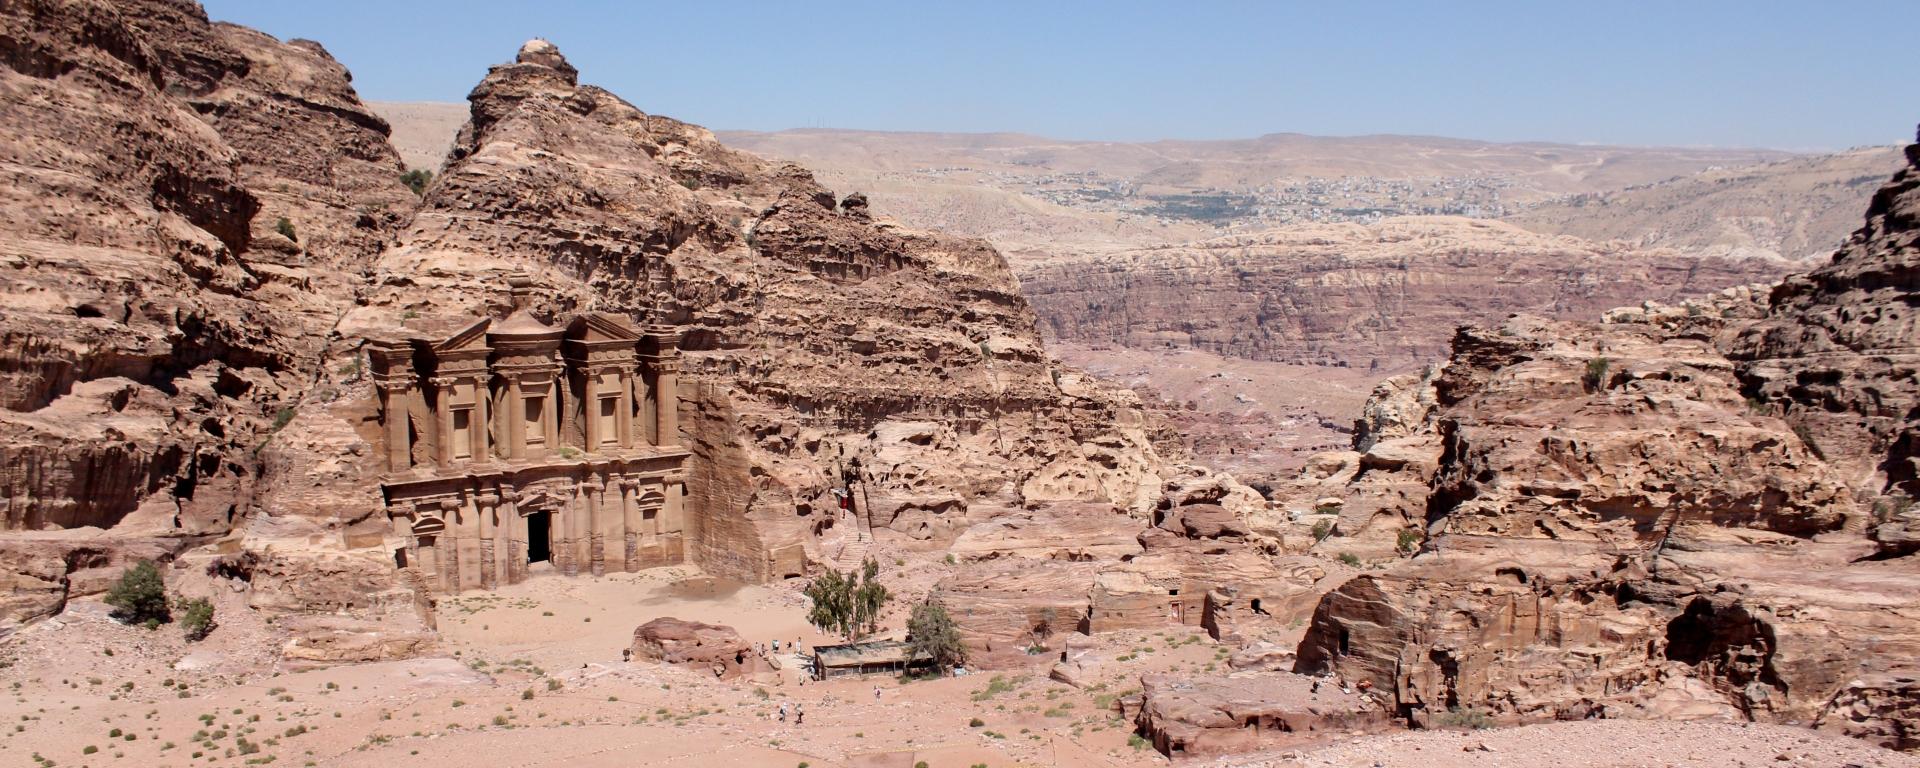 Petra, Jordan, Petra Jordan, Petra City, Ancient City of Petra, Petra travel